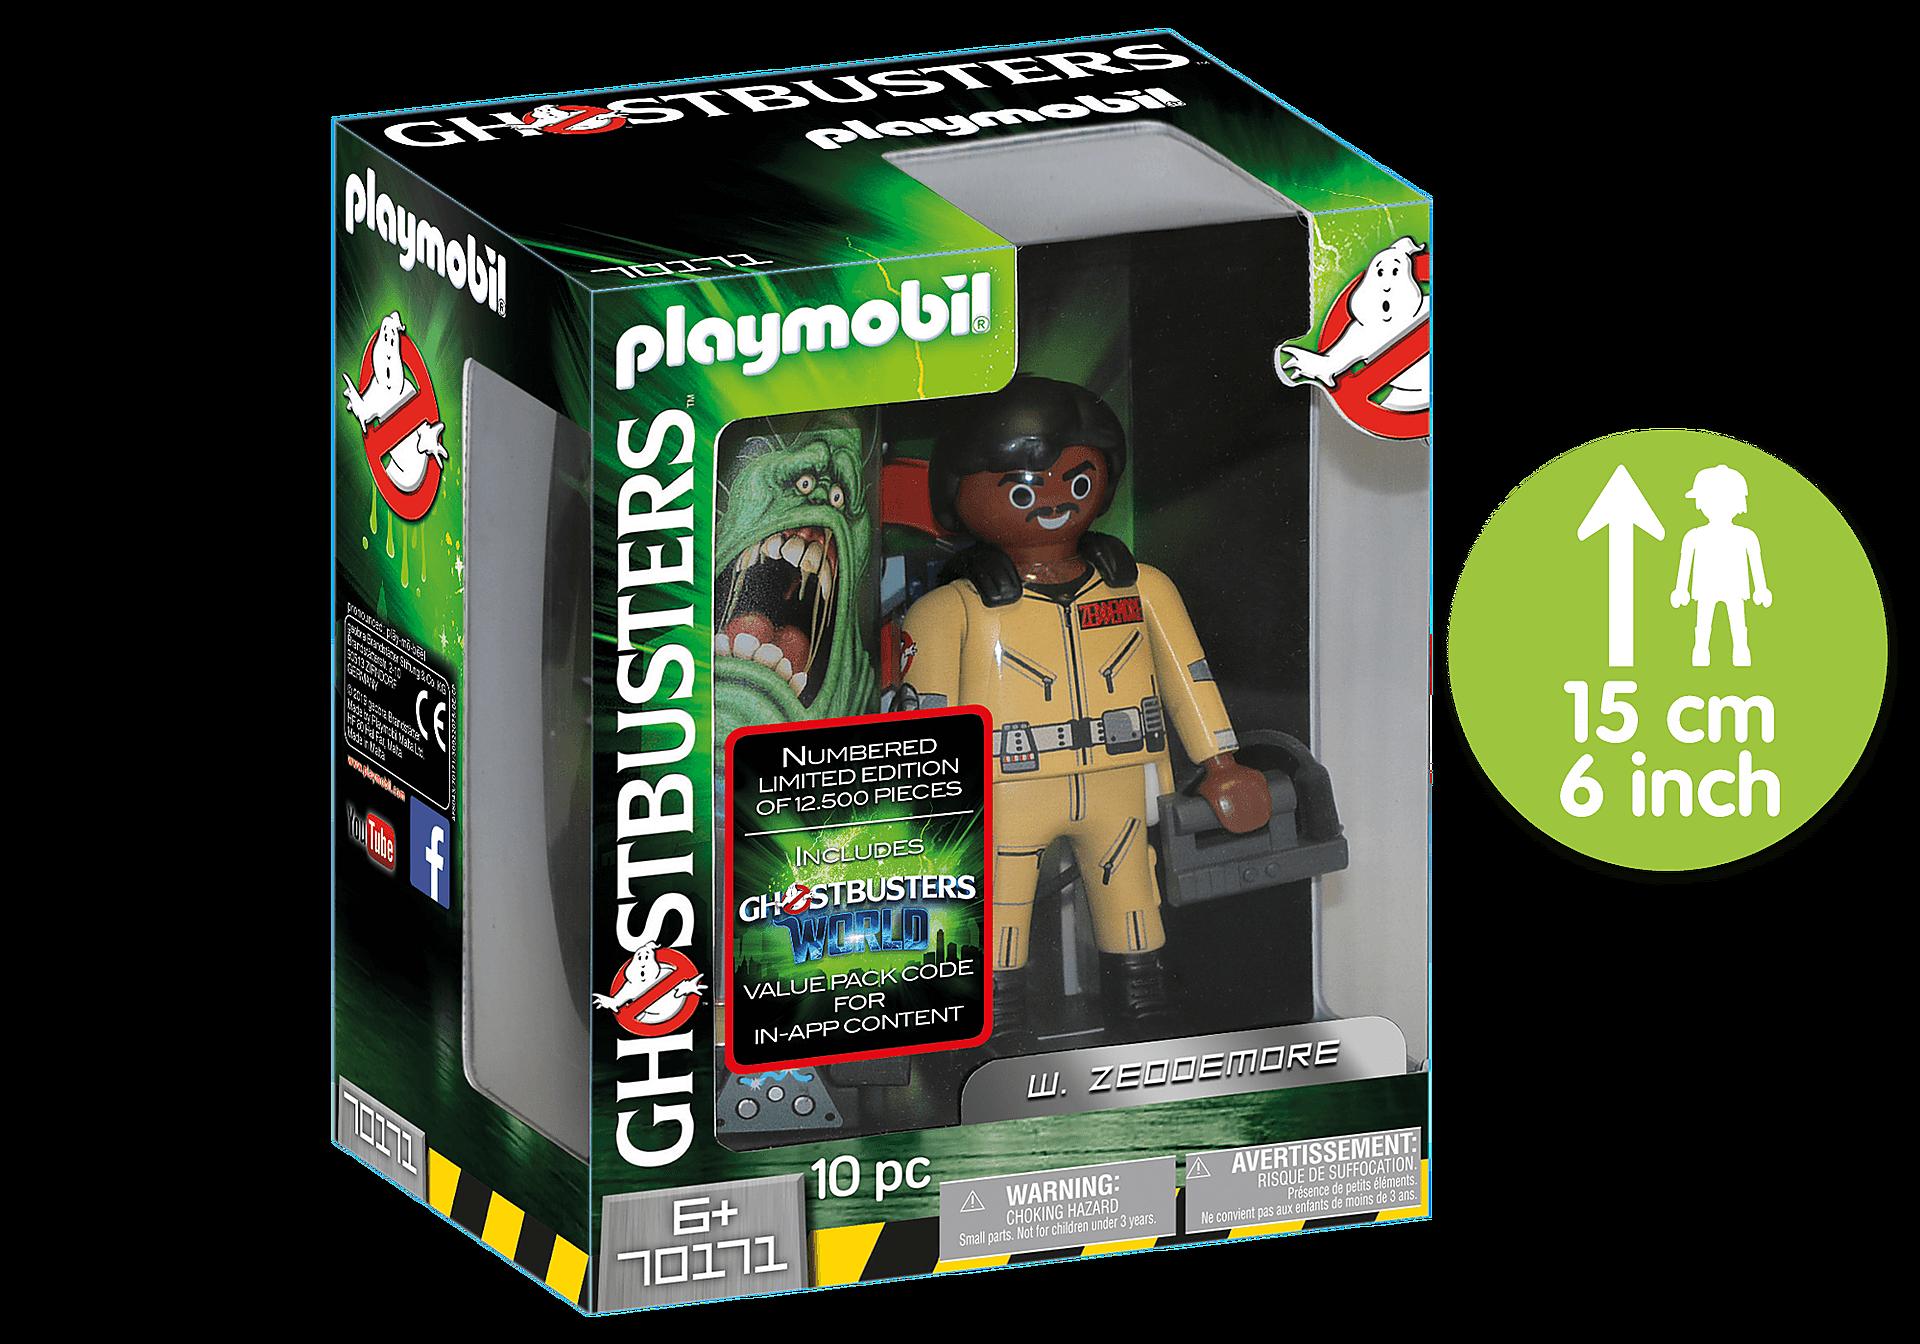 http://media.playmobil.com/i/playmobil/70171_product_detail/Ghostbusters™ Sammlerfigur W. Zeddemore